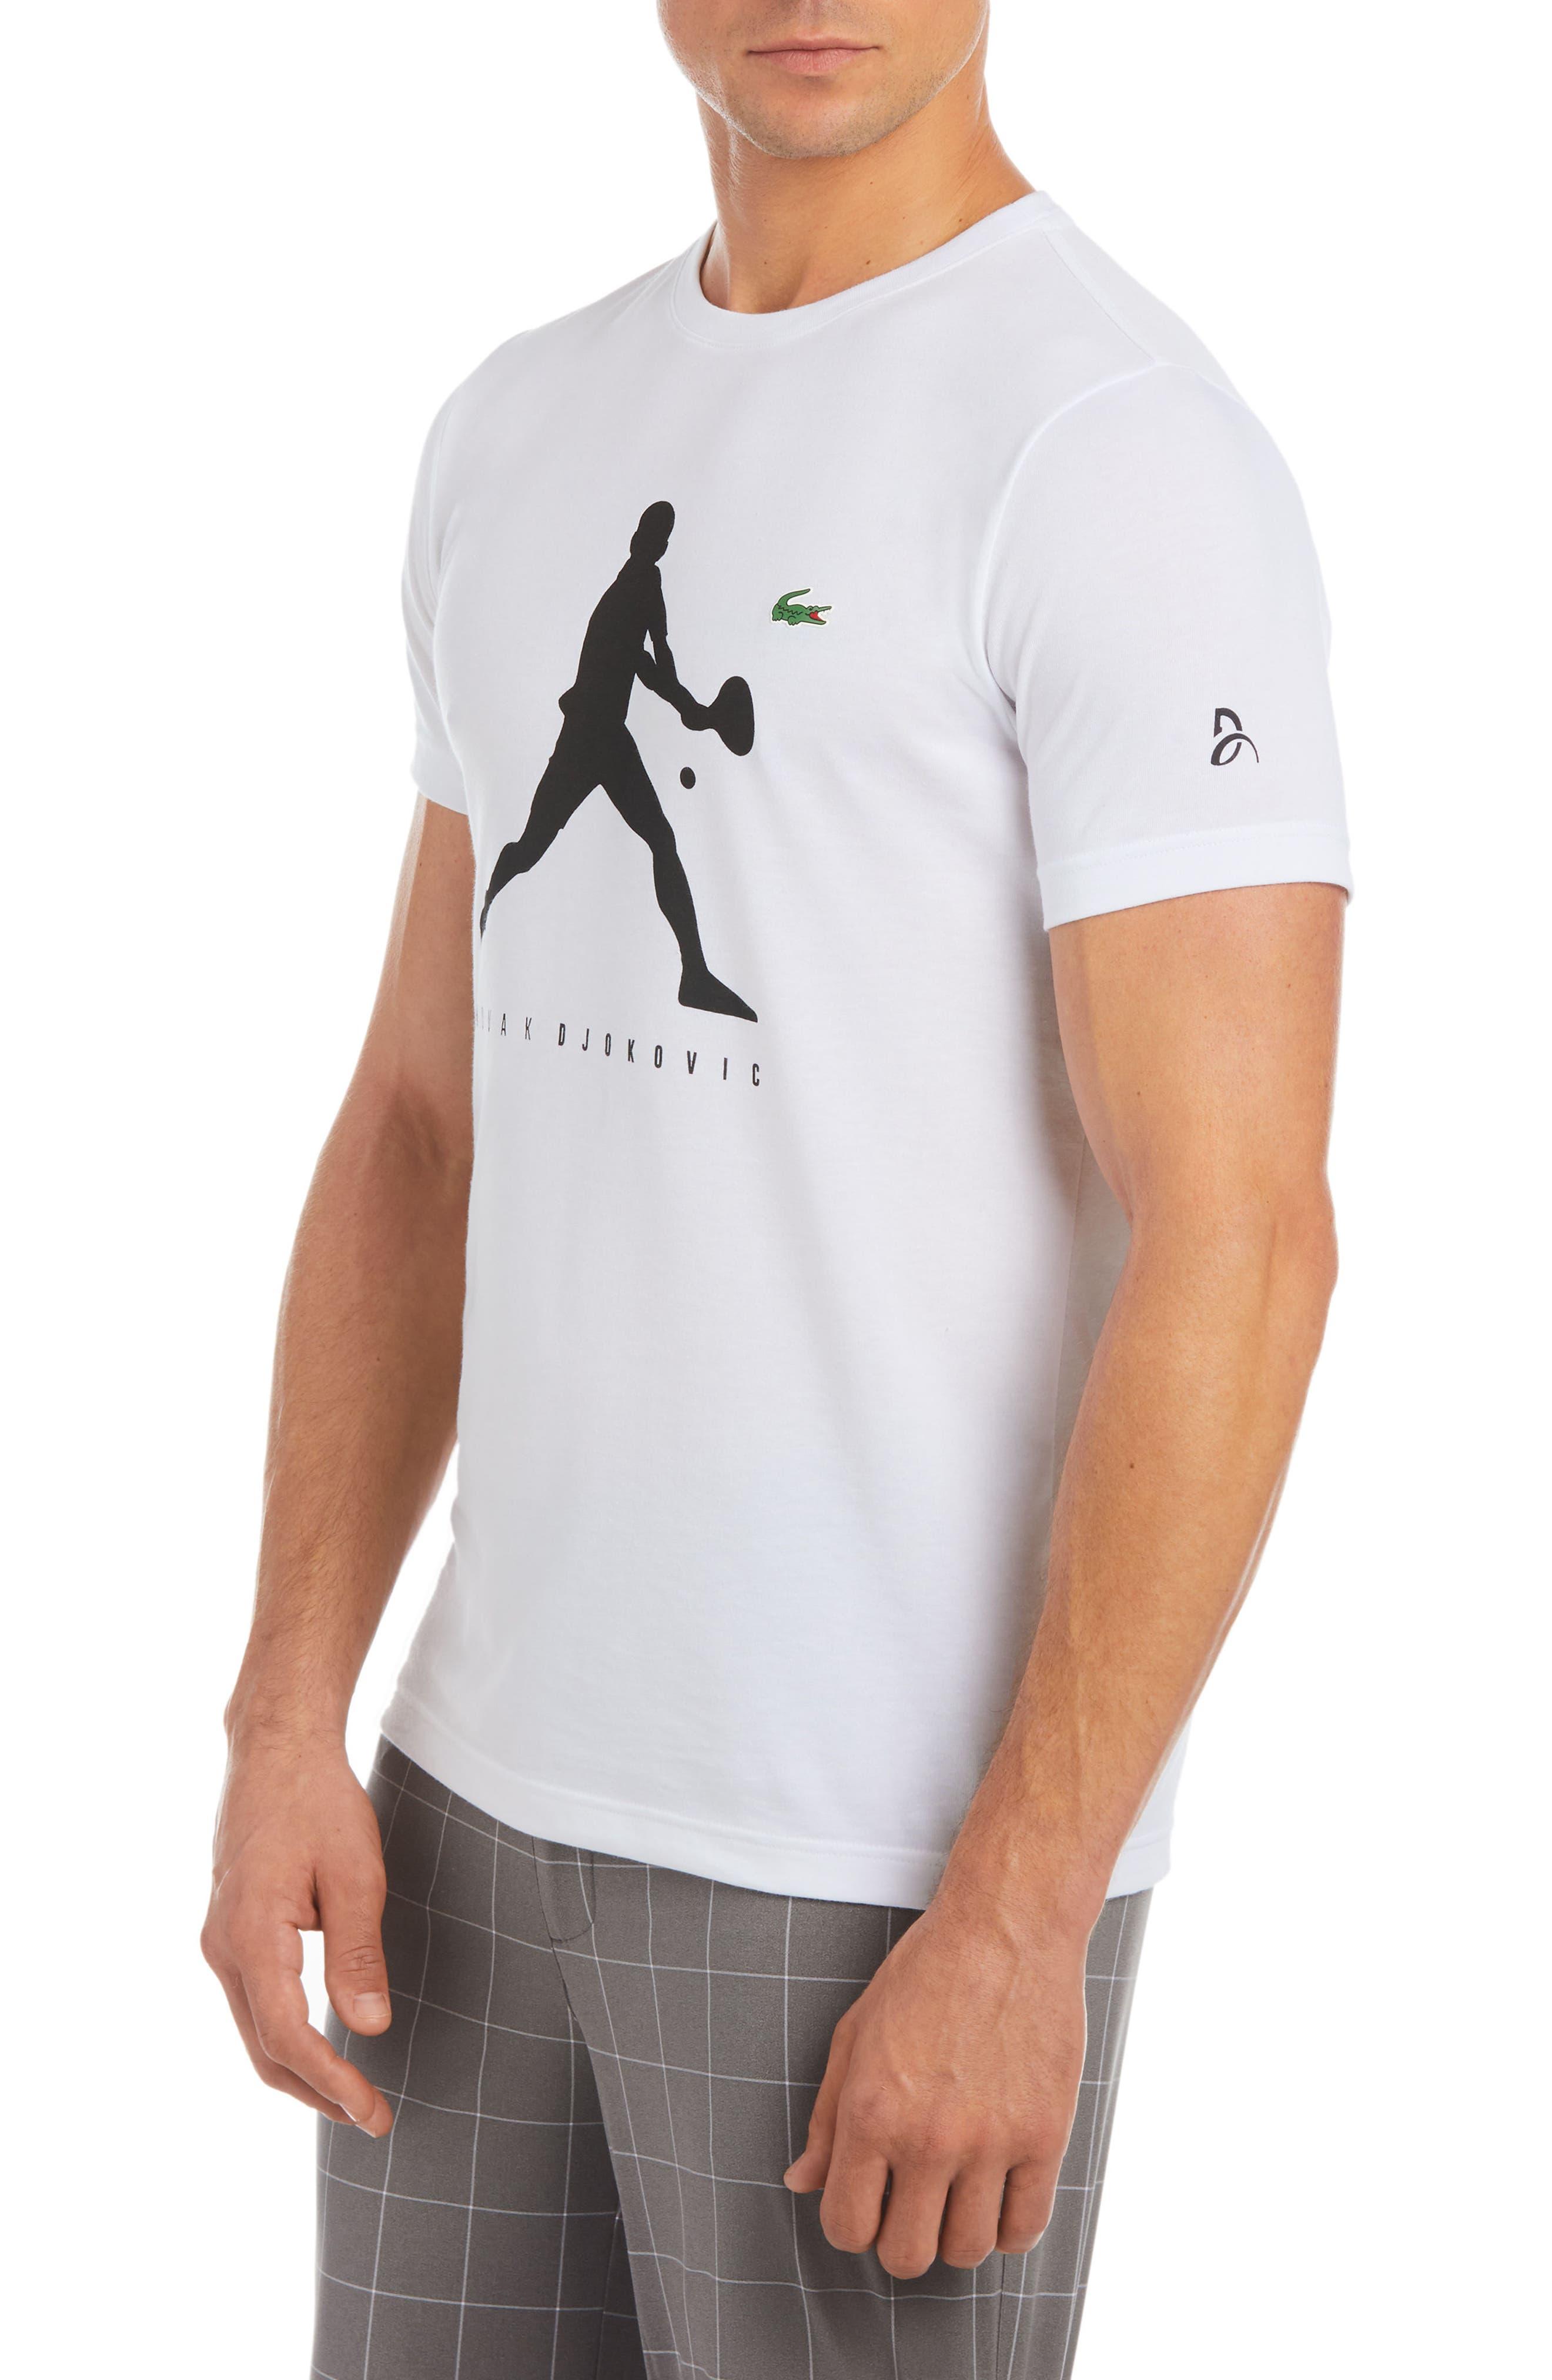 Extensible T-Shirt,                             Alternate thumbnail 2, color,                             White/ Black